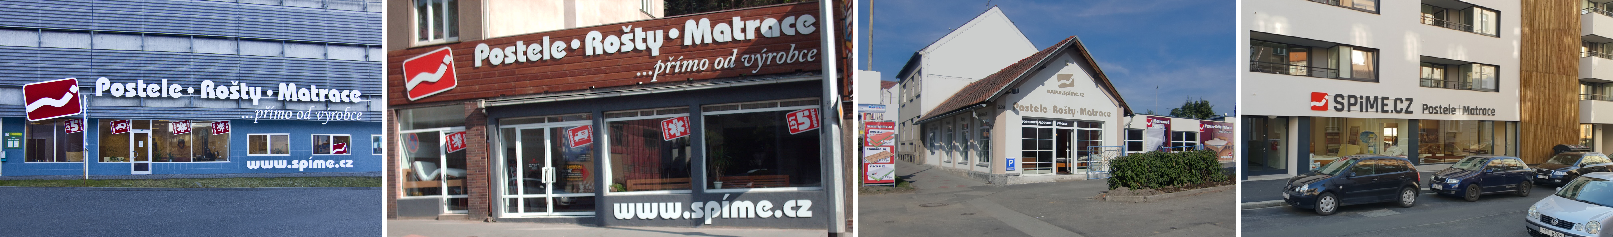 Prodejny Spime.cz Brno Praha Tábor Plzeň